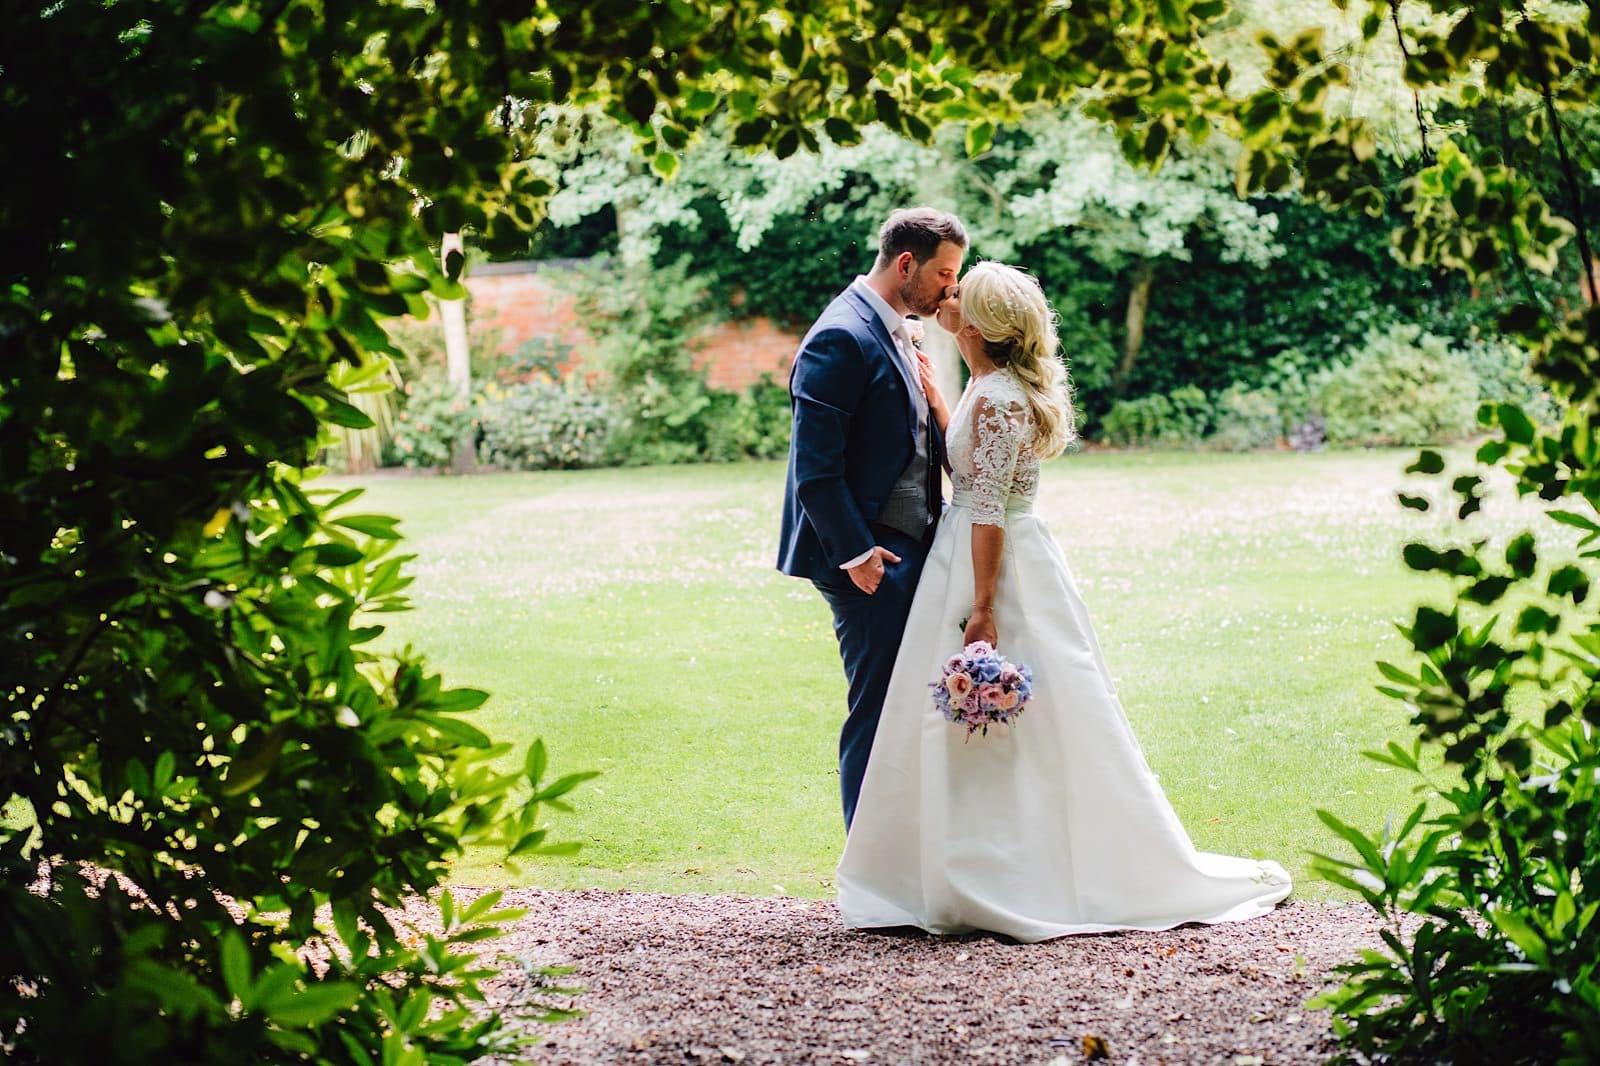 pendrell-hall-wedding-photography-0028